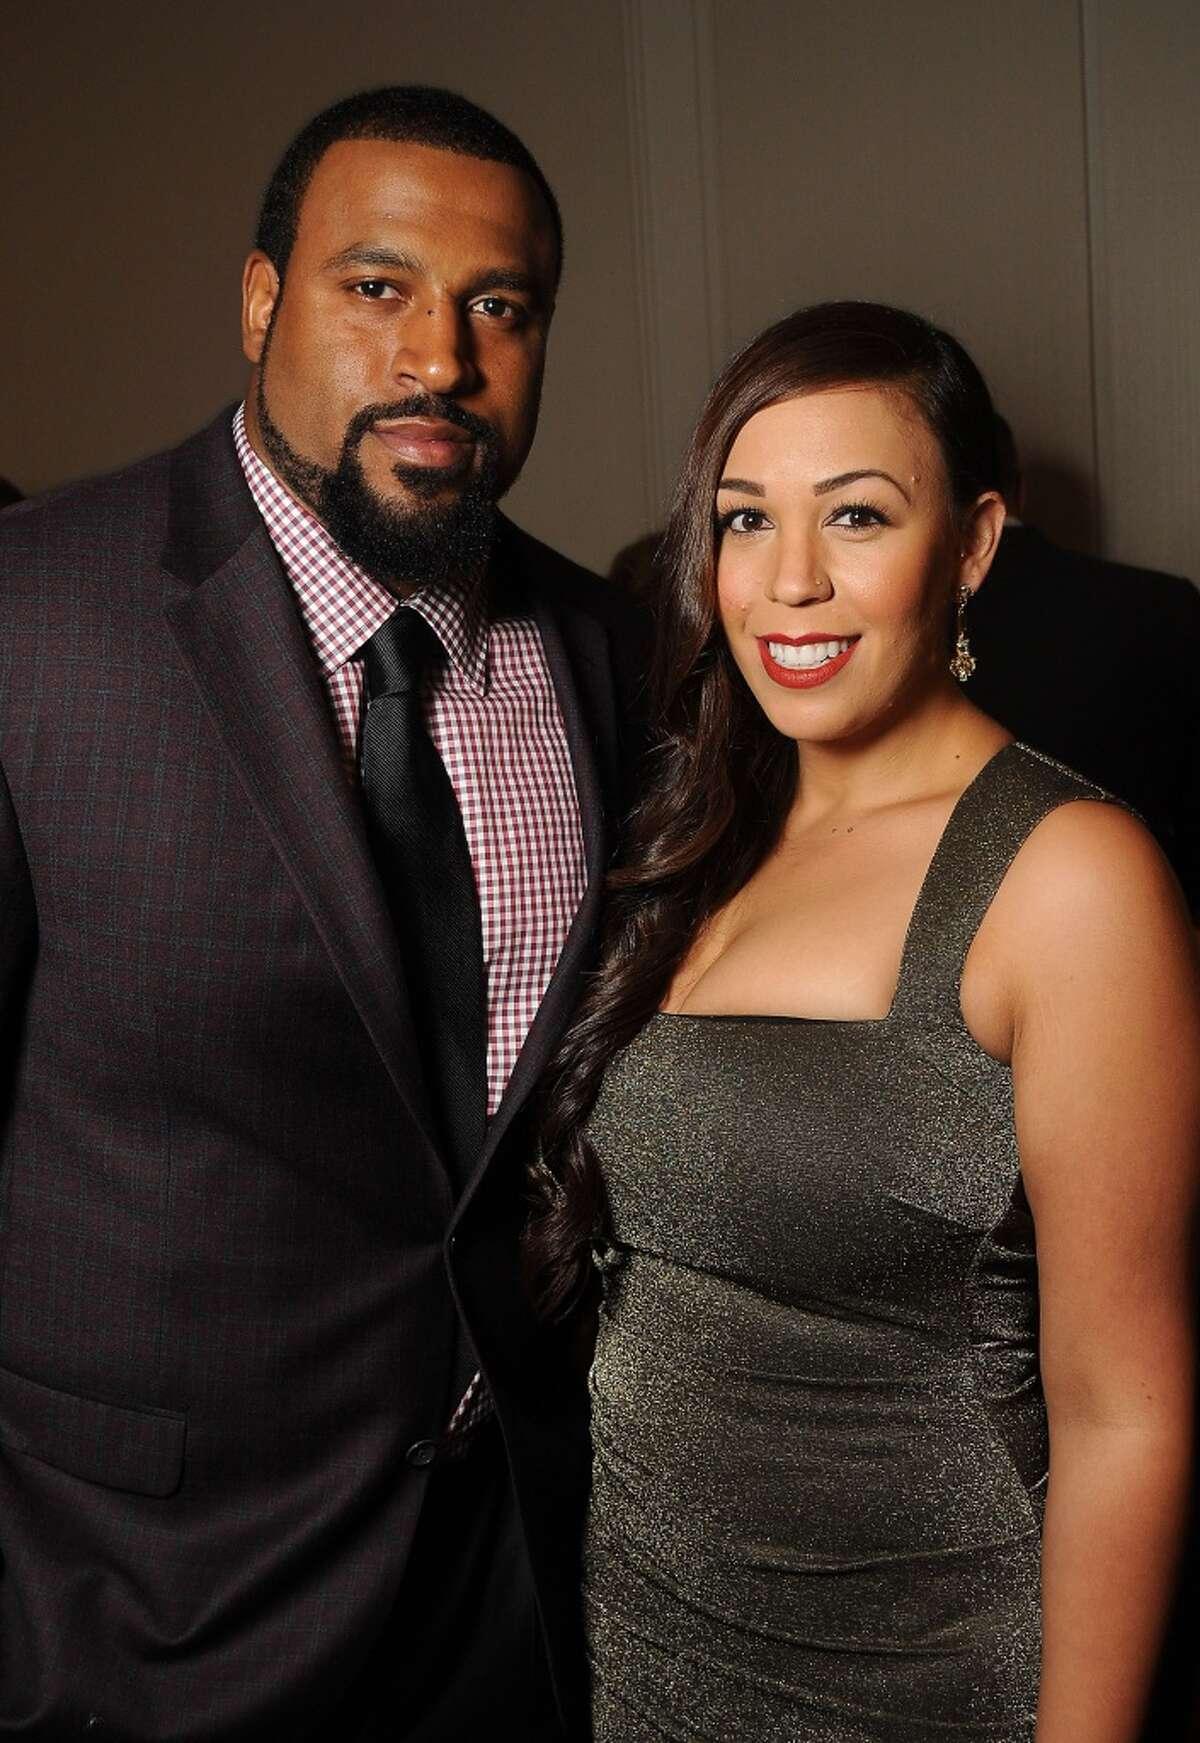 November : Duane Brown and his wife Devi at the Festari Una Notte in Italia fashion show and dinner.